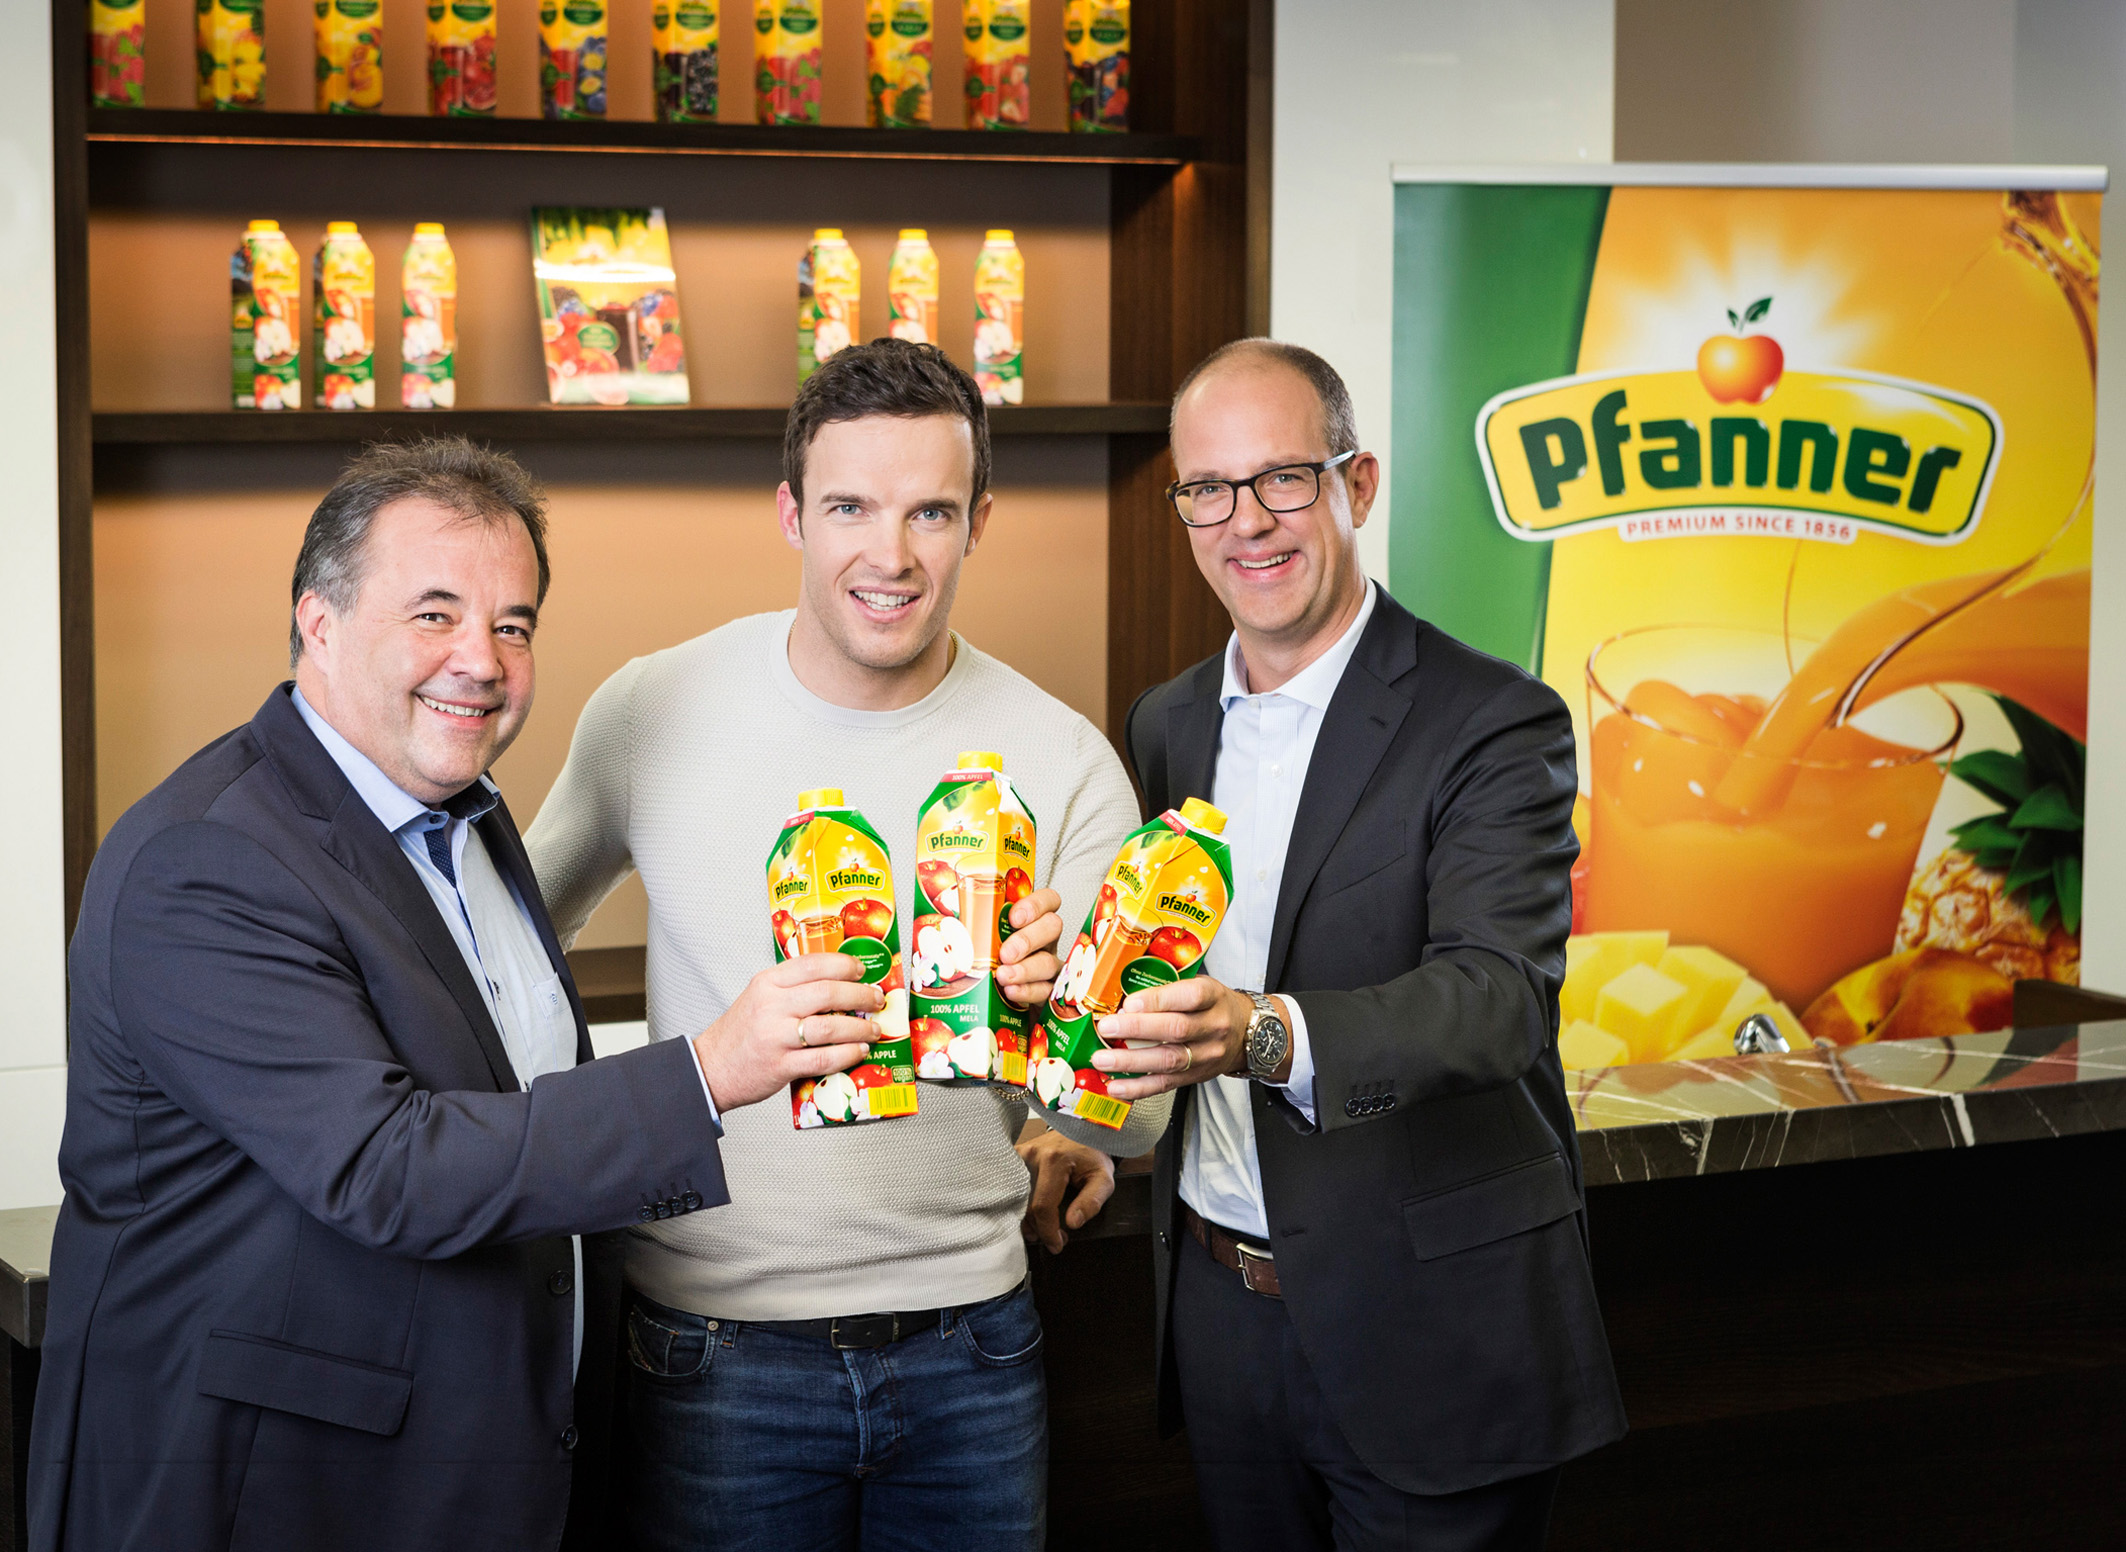 Pfanner-Innerhofer-Stangl: